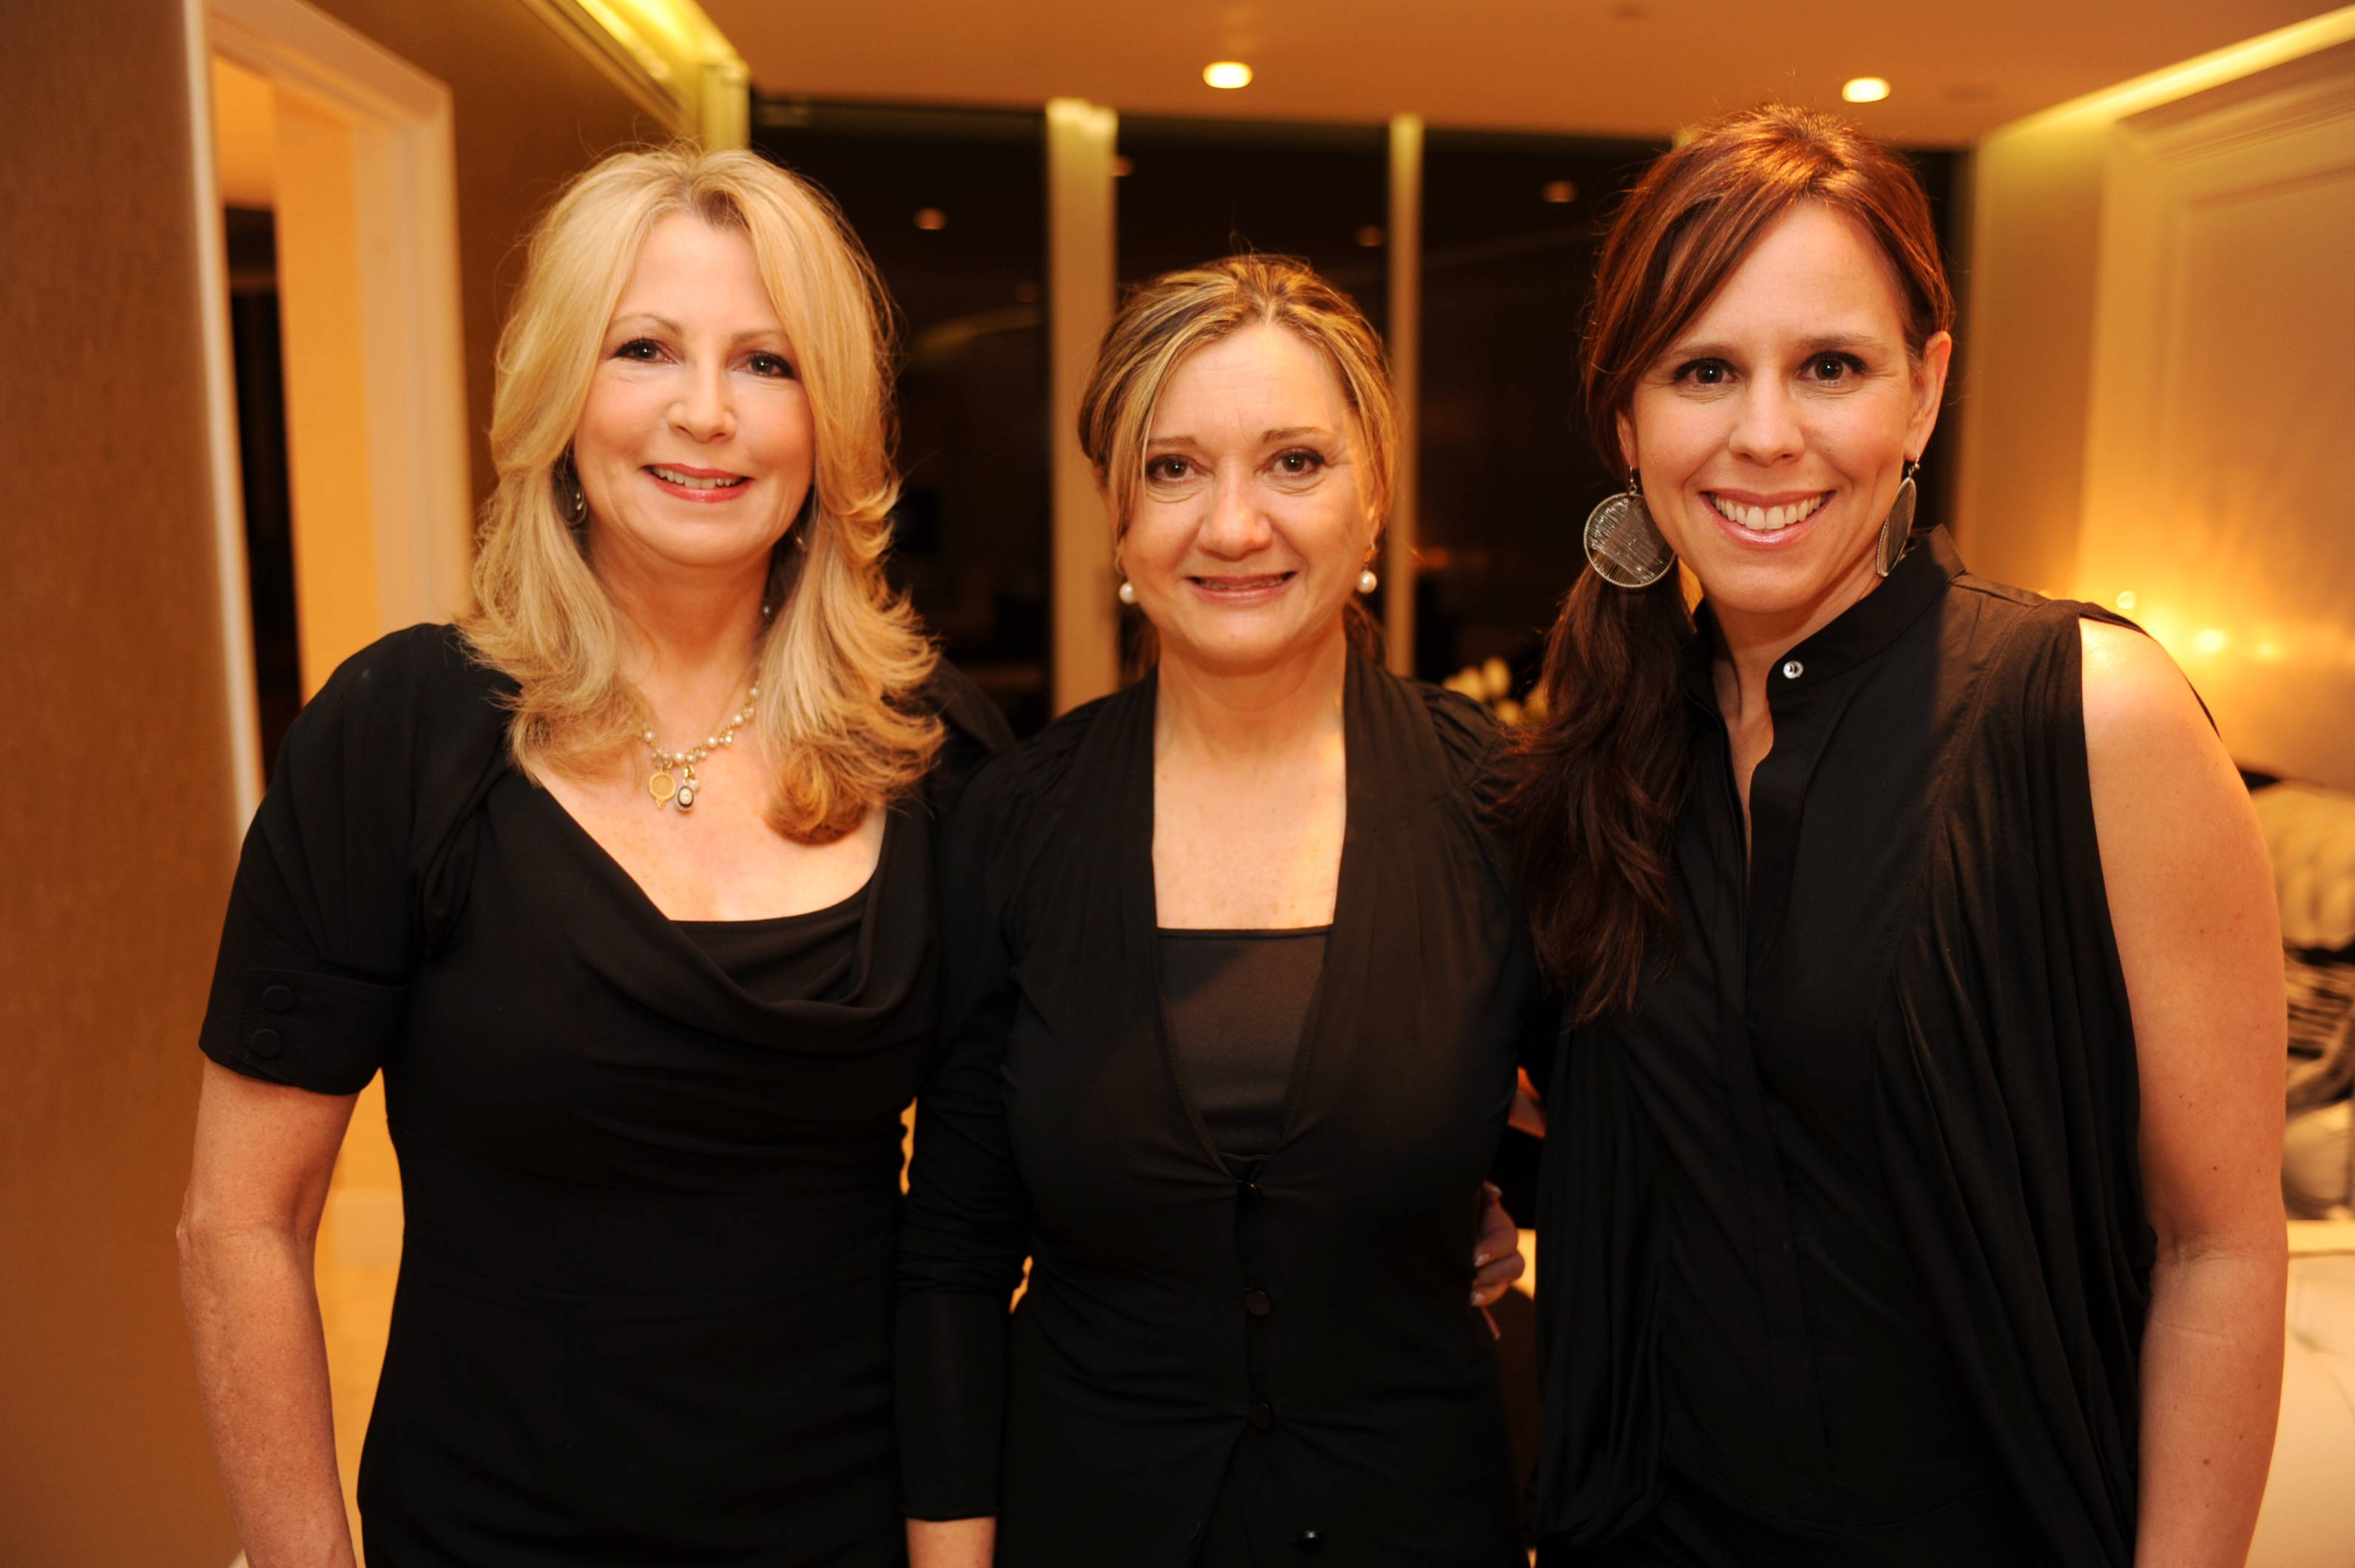 Deborah Slack, Vania Dos Santos, & Jennie King